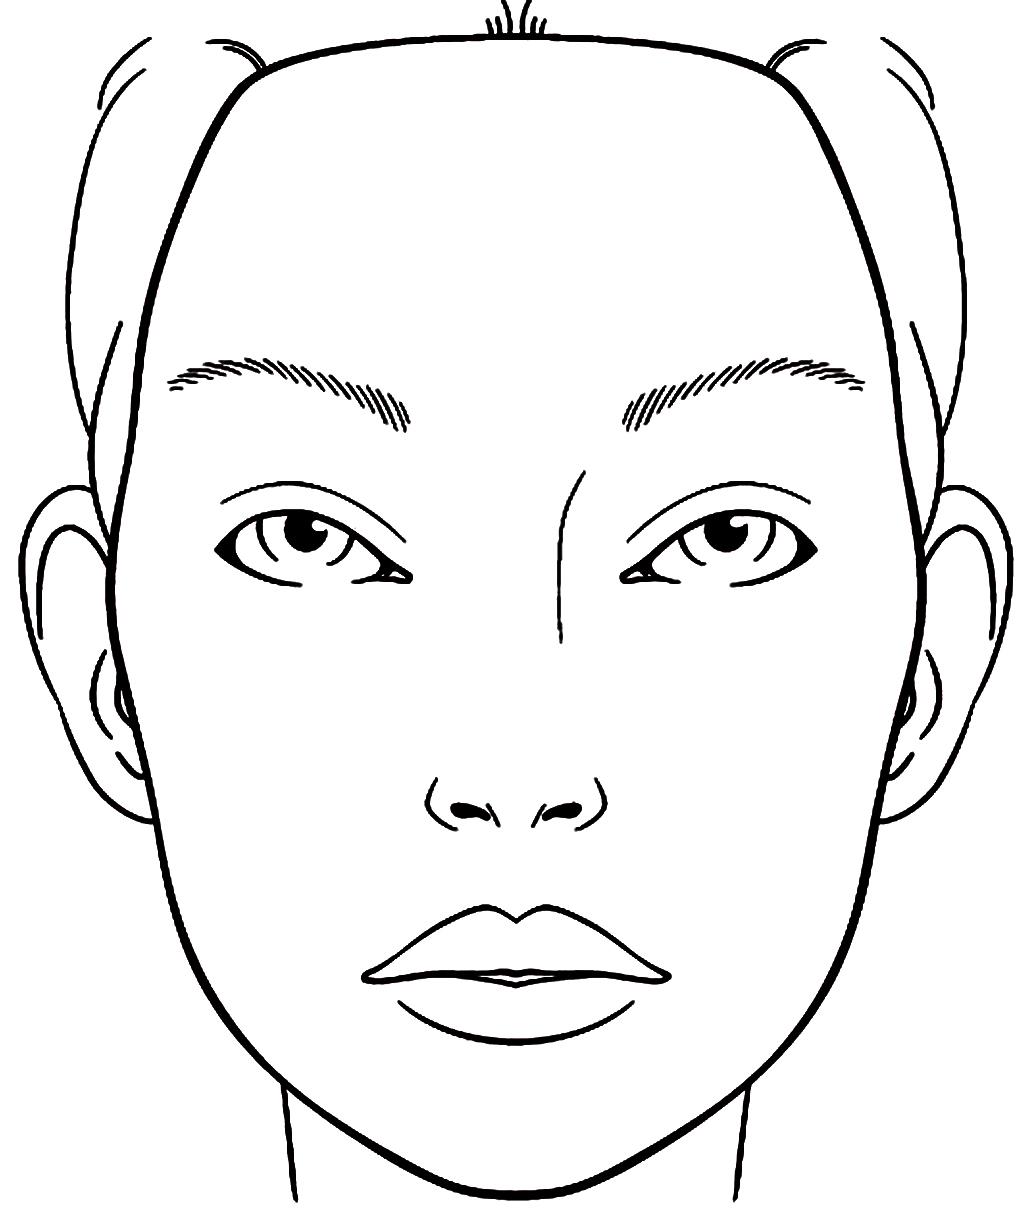 Blank Face Sketch